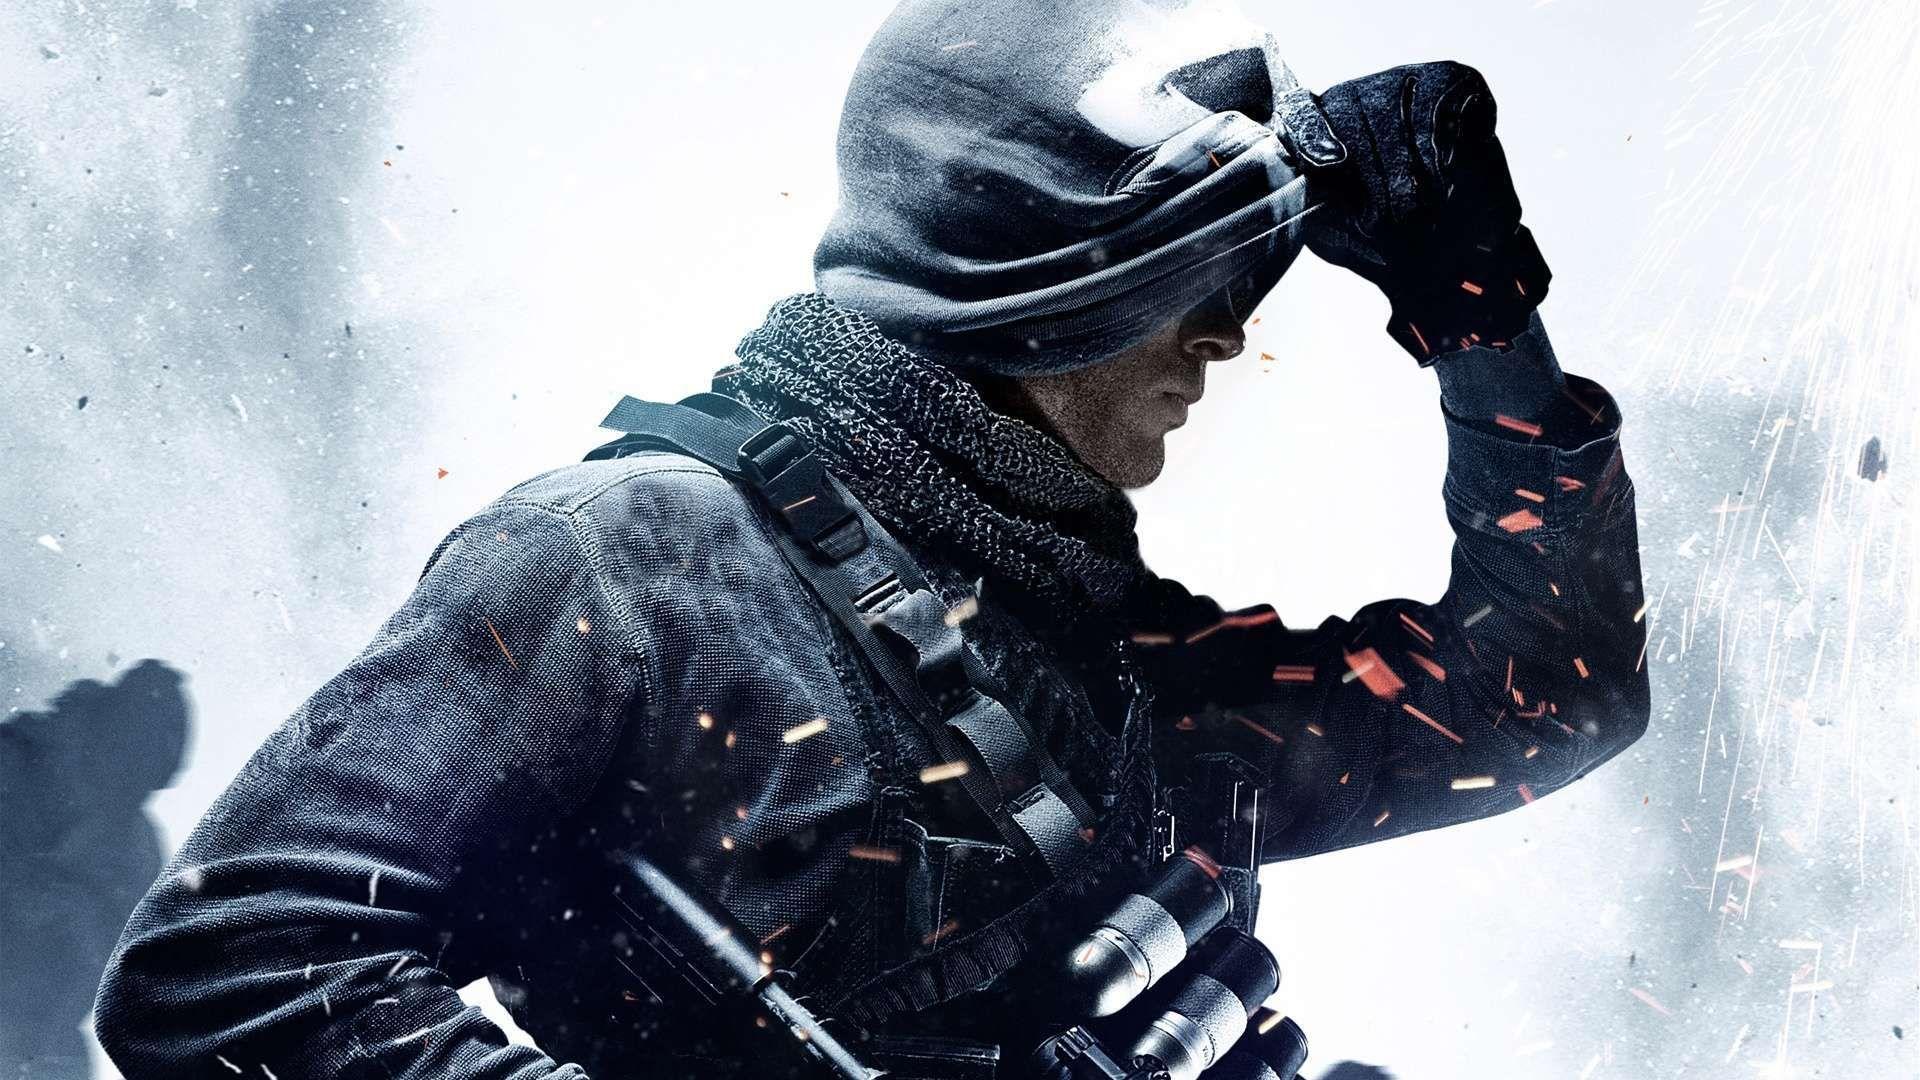 Call Of Duty Ghosts Game Hd Wallpaper 1080p Geek In 2019 Ghost